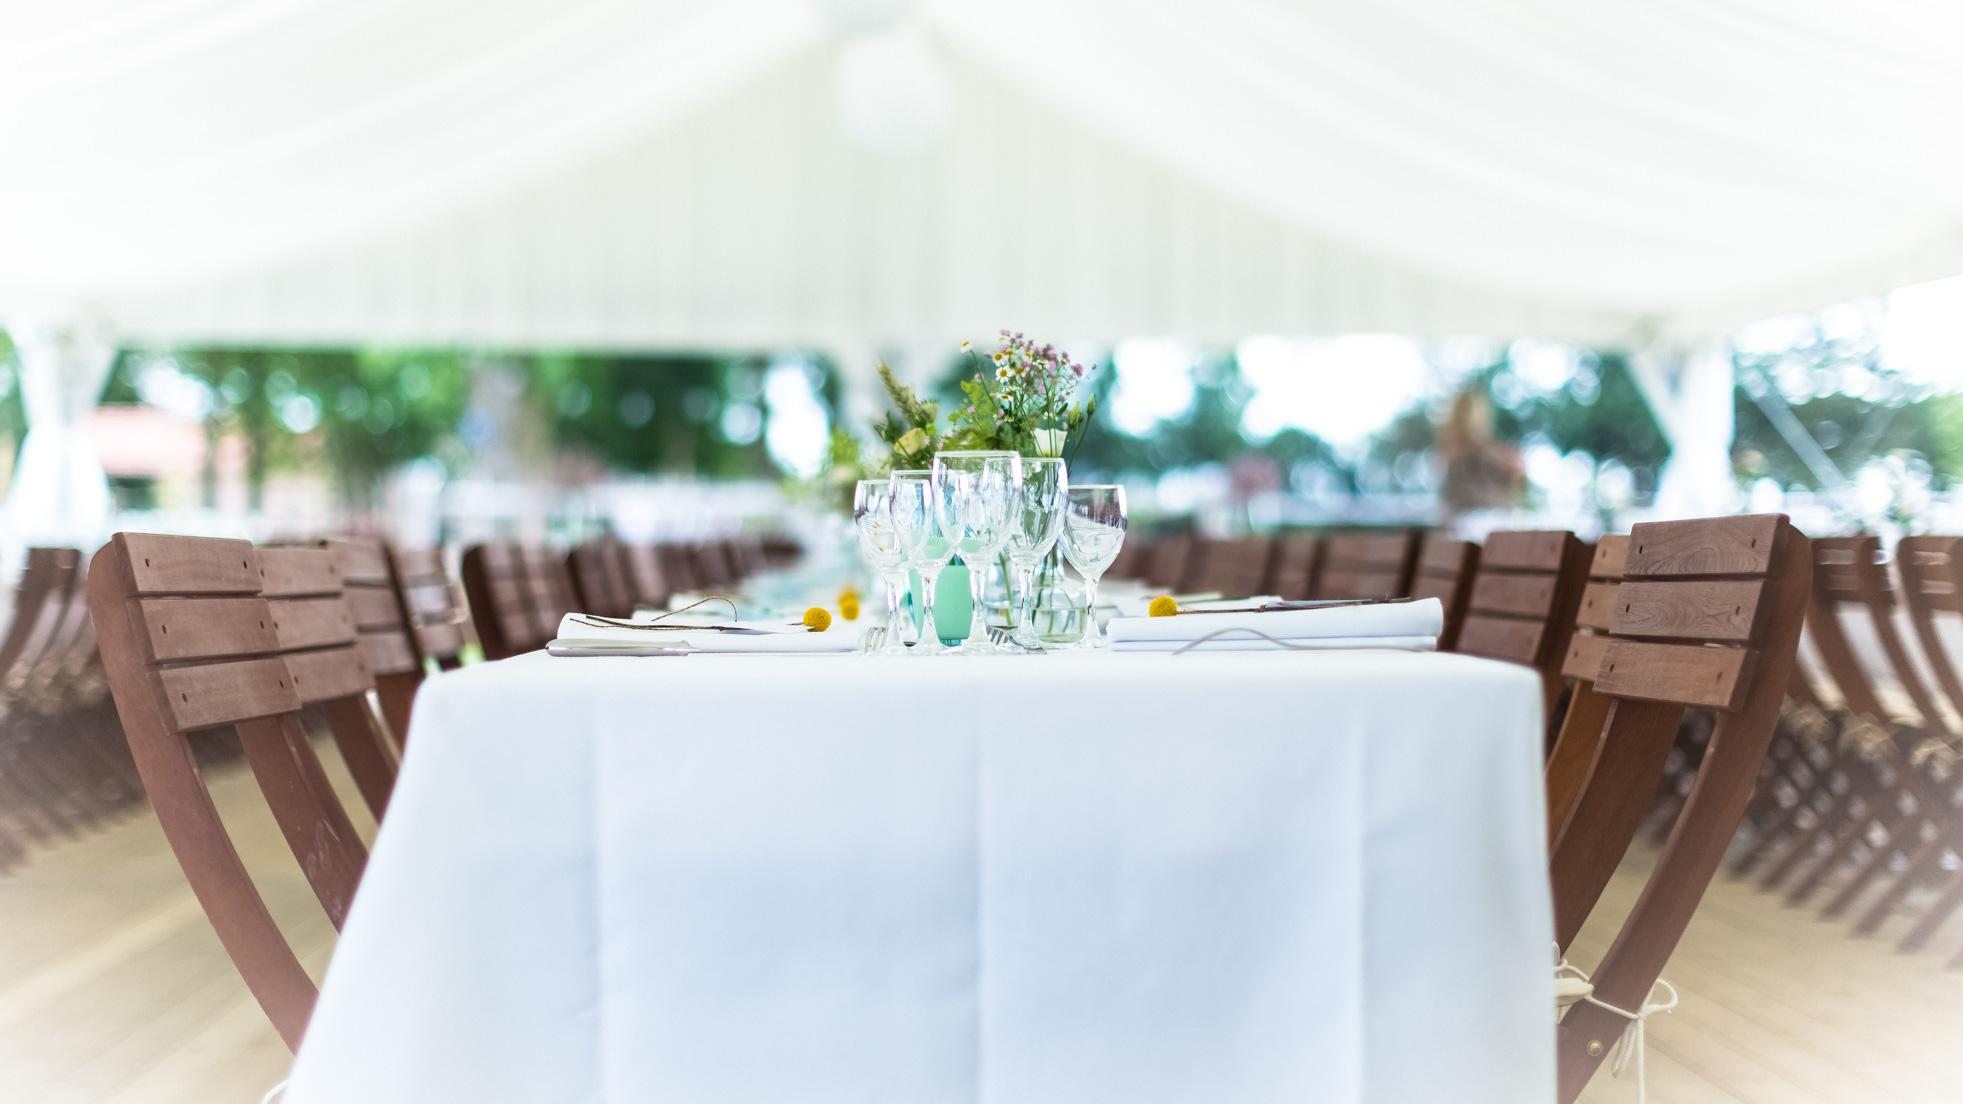 event table dressée.jpg